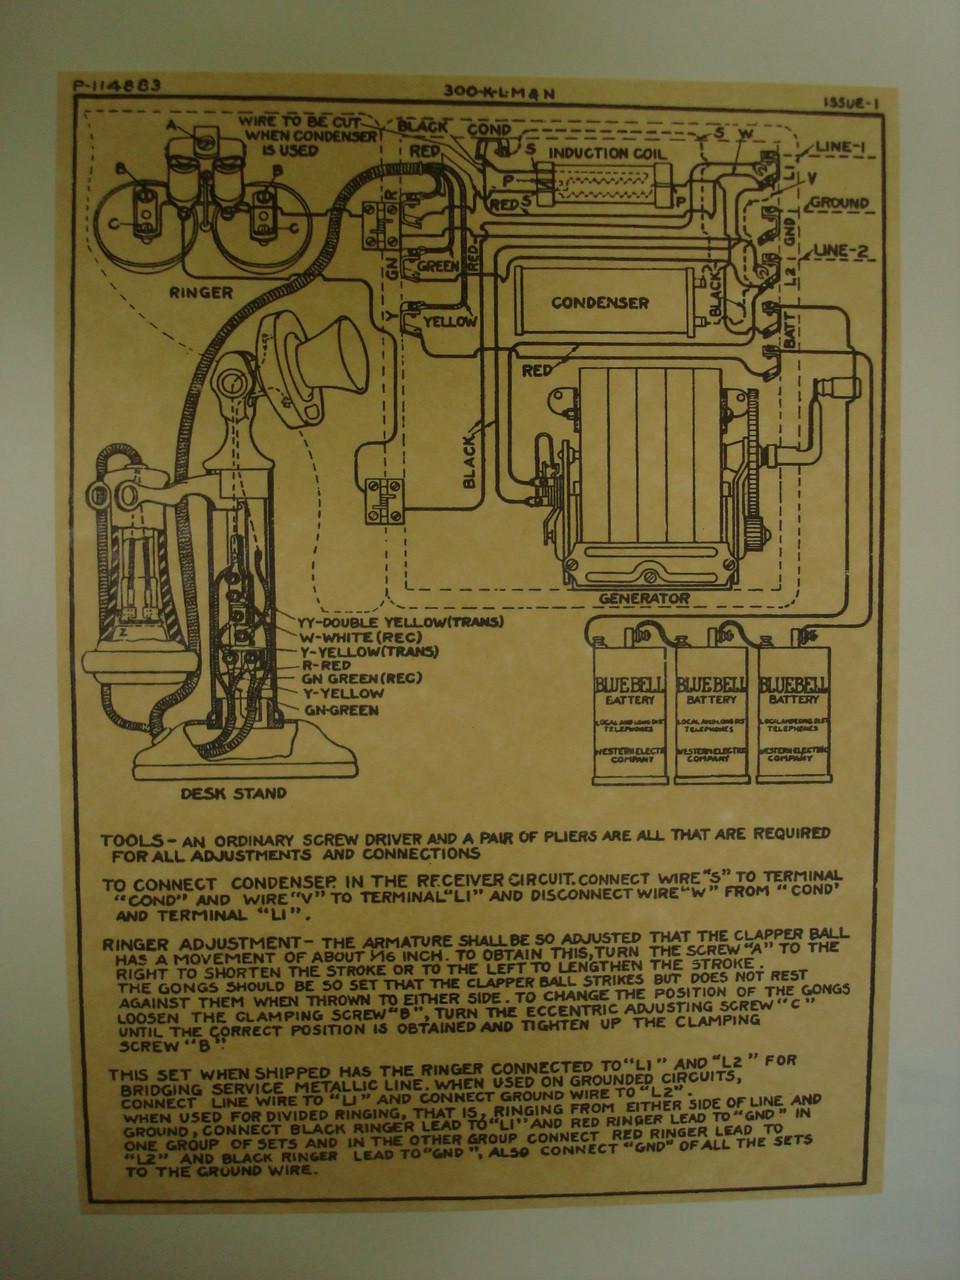 candlestick phone wiring wiring diagrams scematic 110 block wiring diagram antique phone wiring diagram [ 960 x 1280 Pixel ]